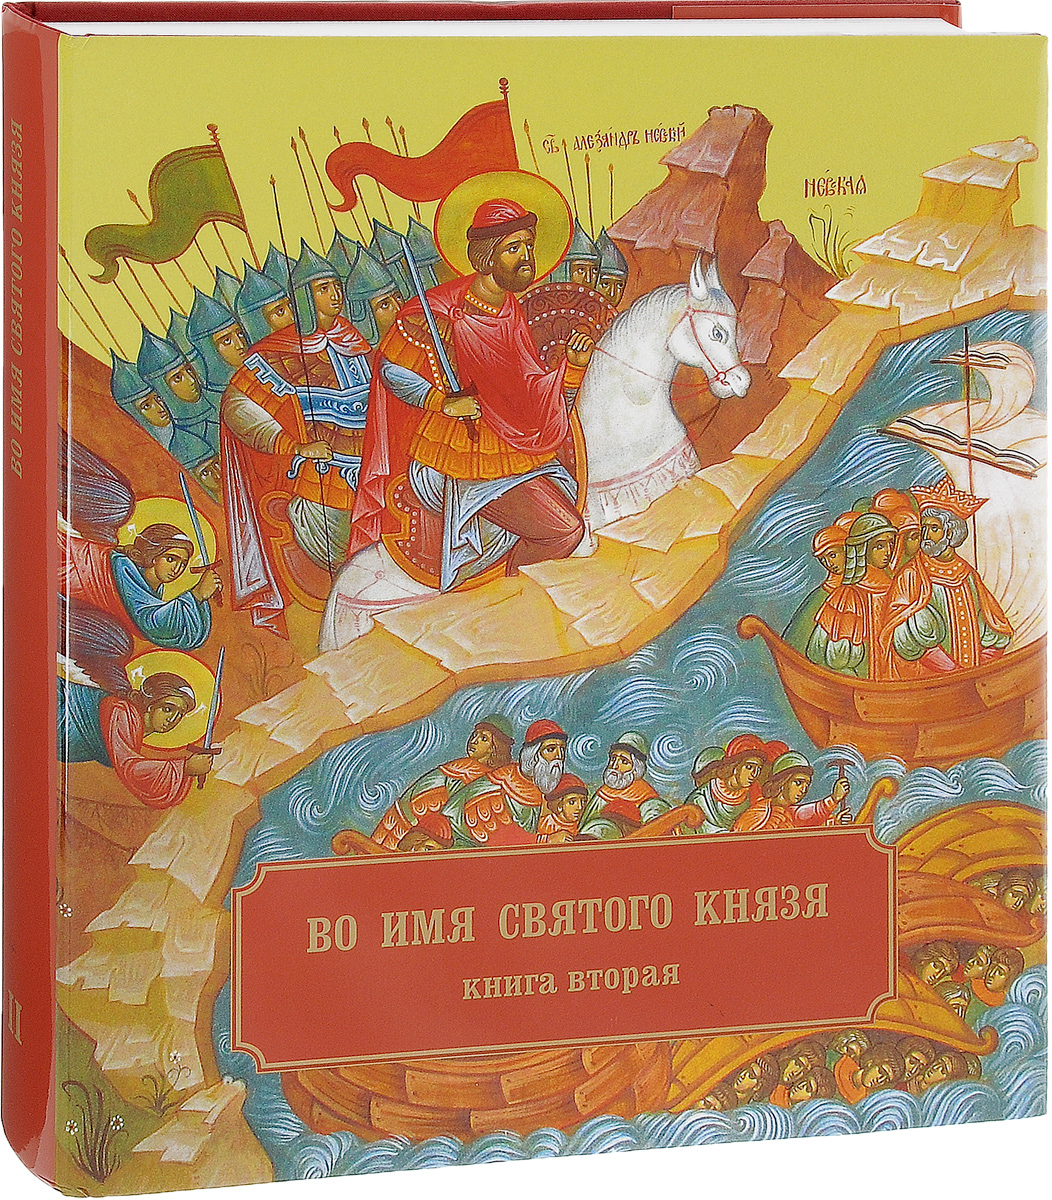 Епископ Кронштадтский Назарий (Лавриненко) Во имя Святого Князя. Книга 2